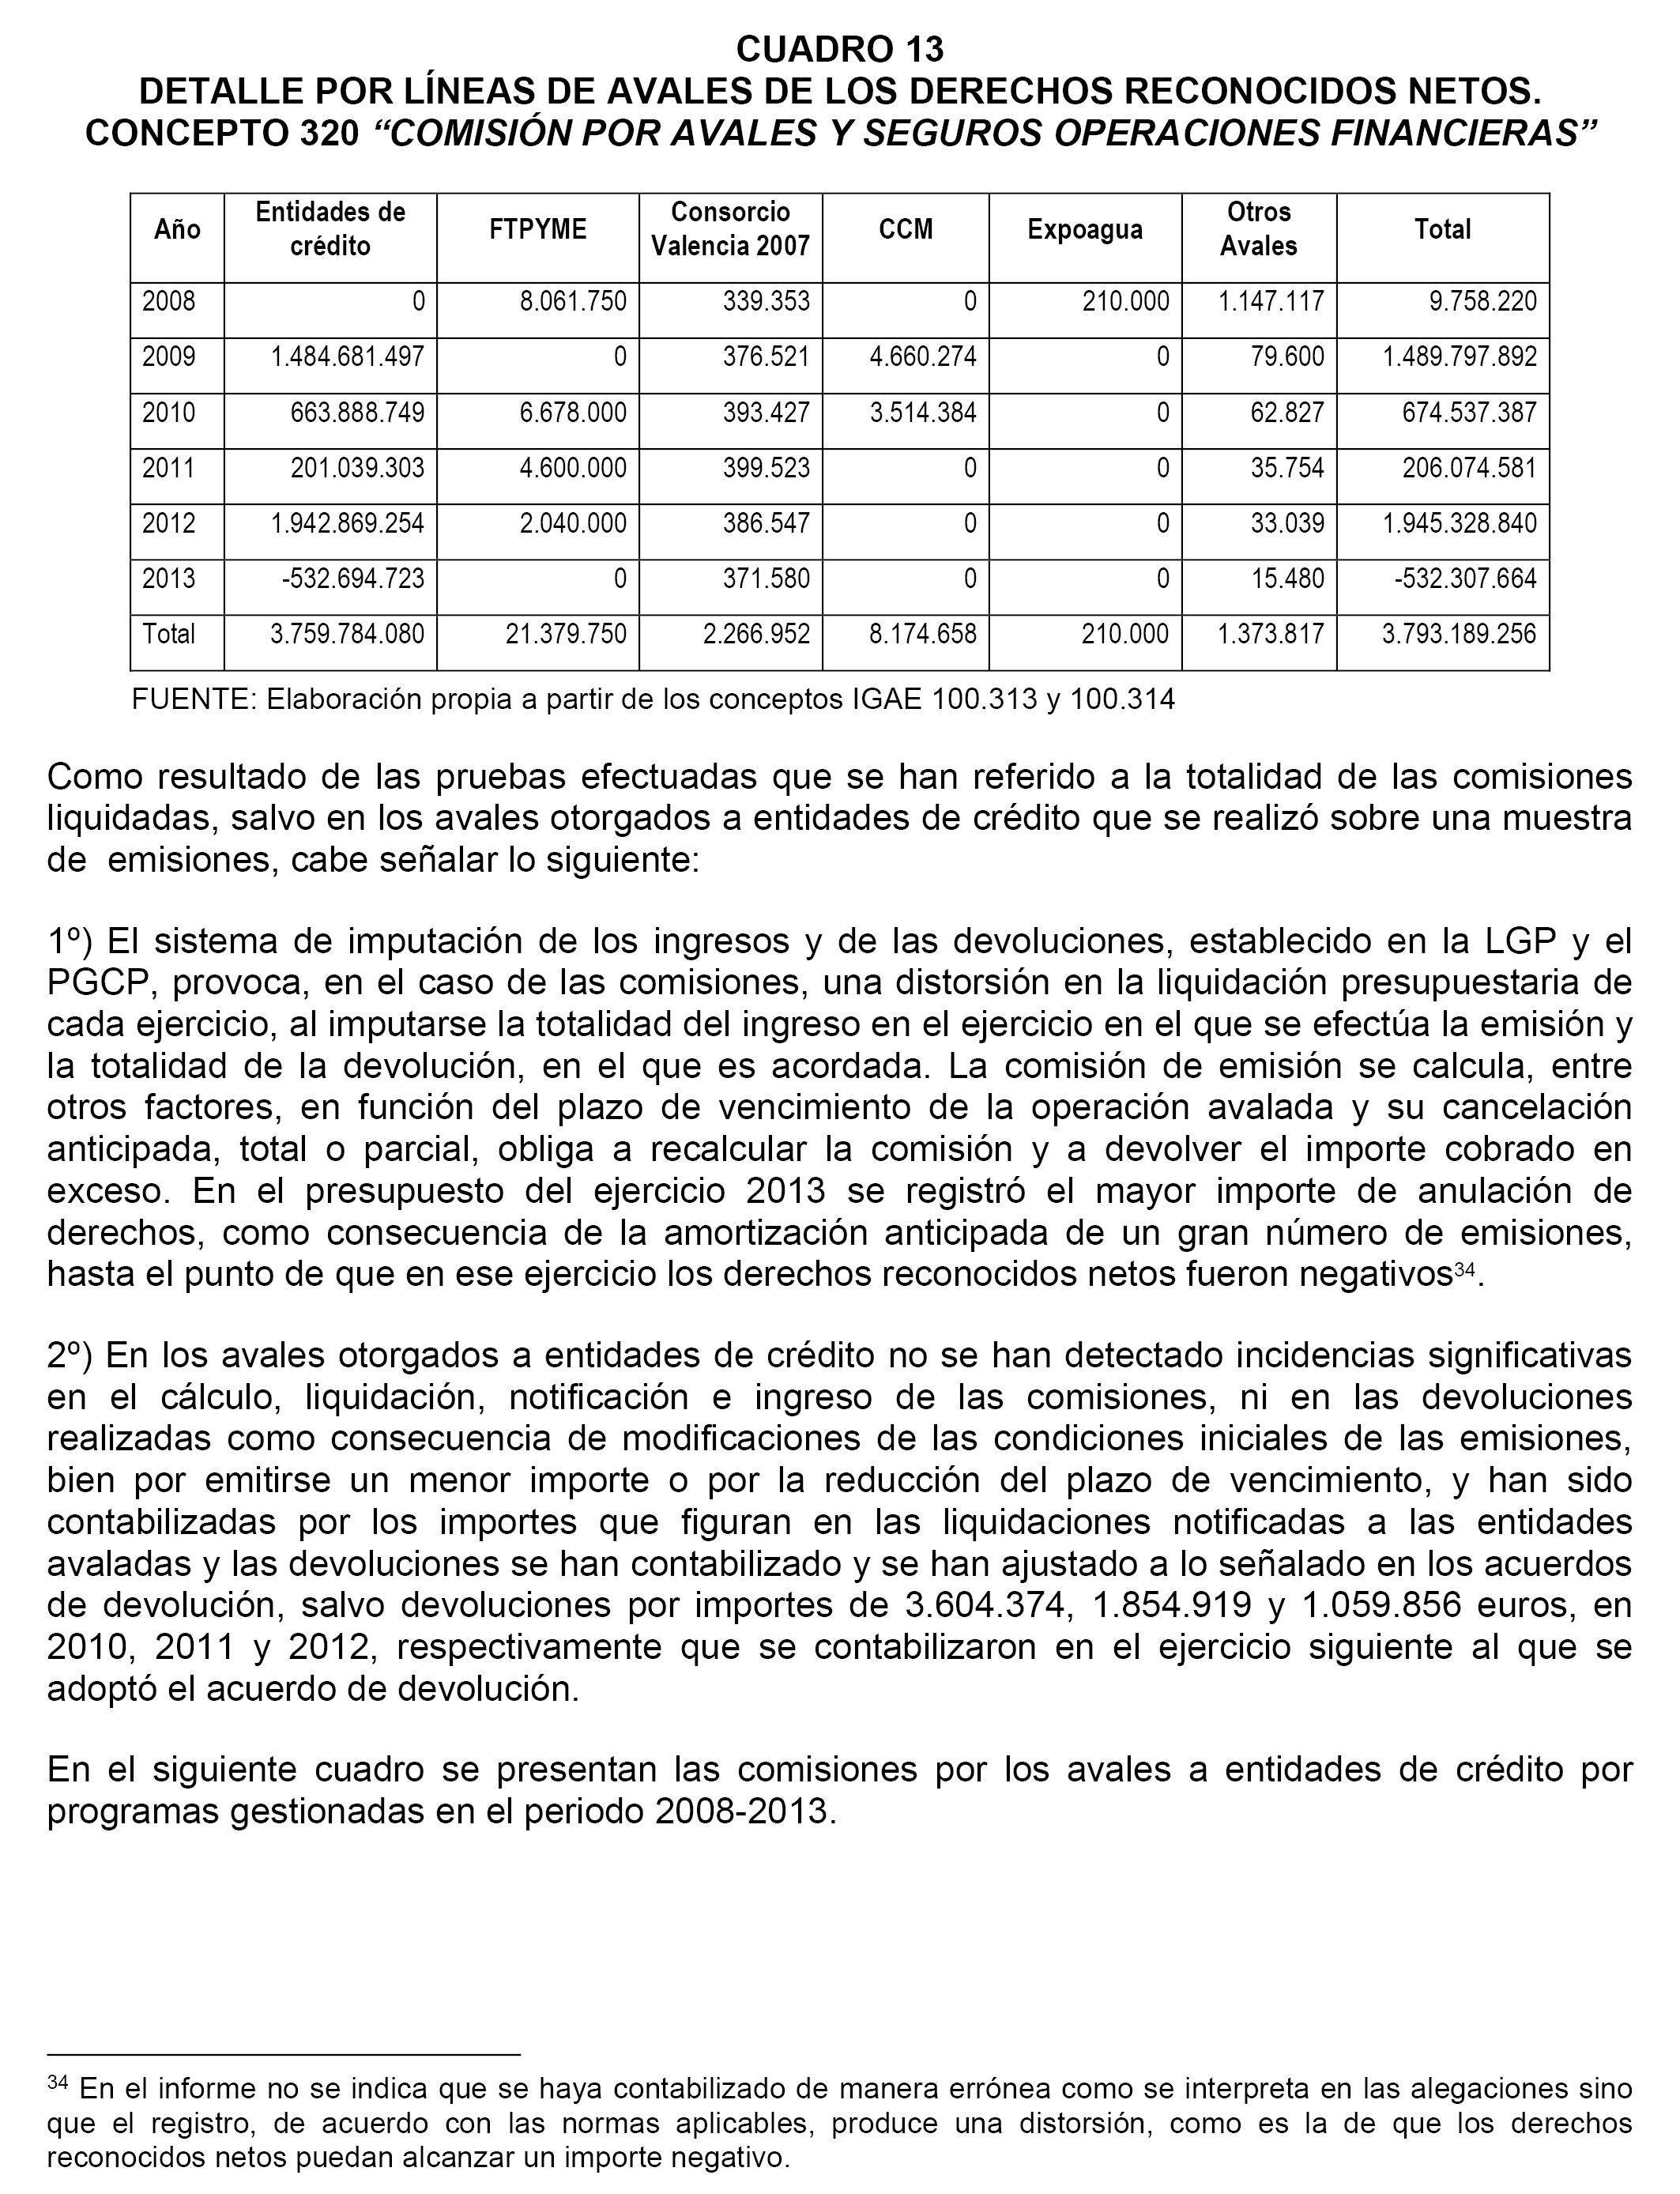 BOE.es - Documento BOE-A-2017-14502